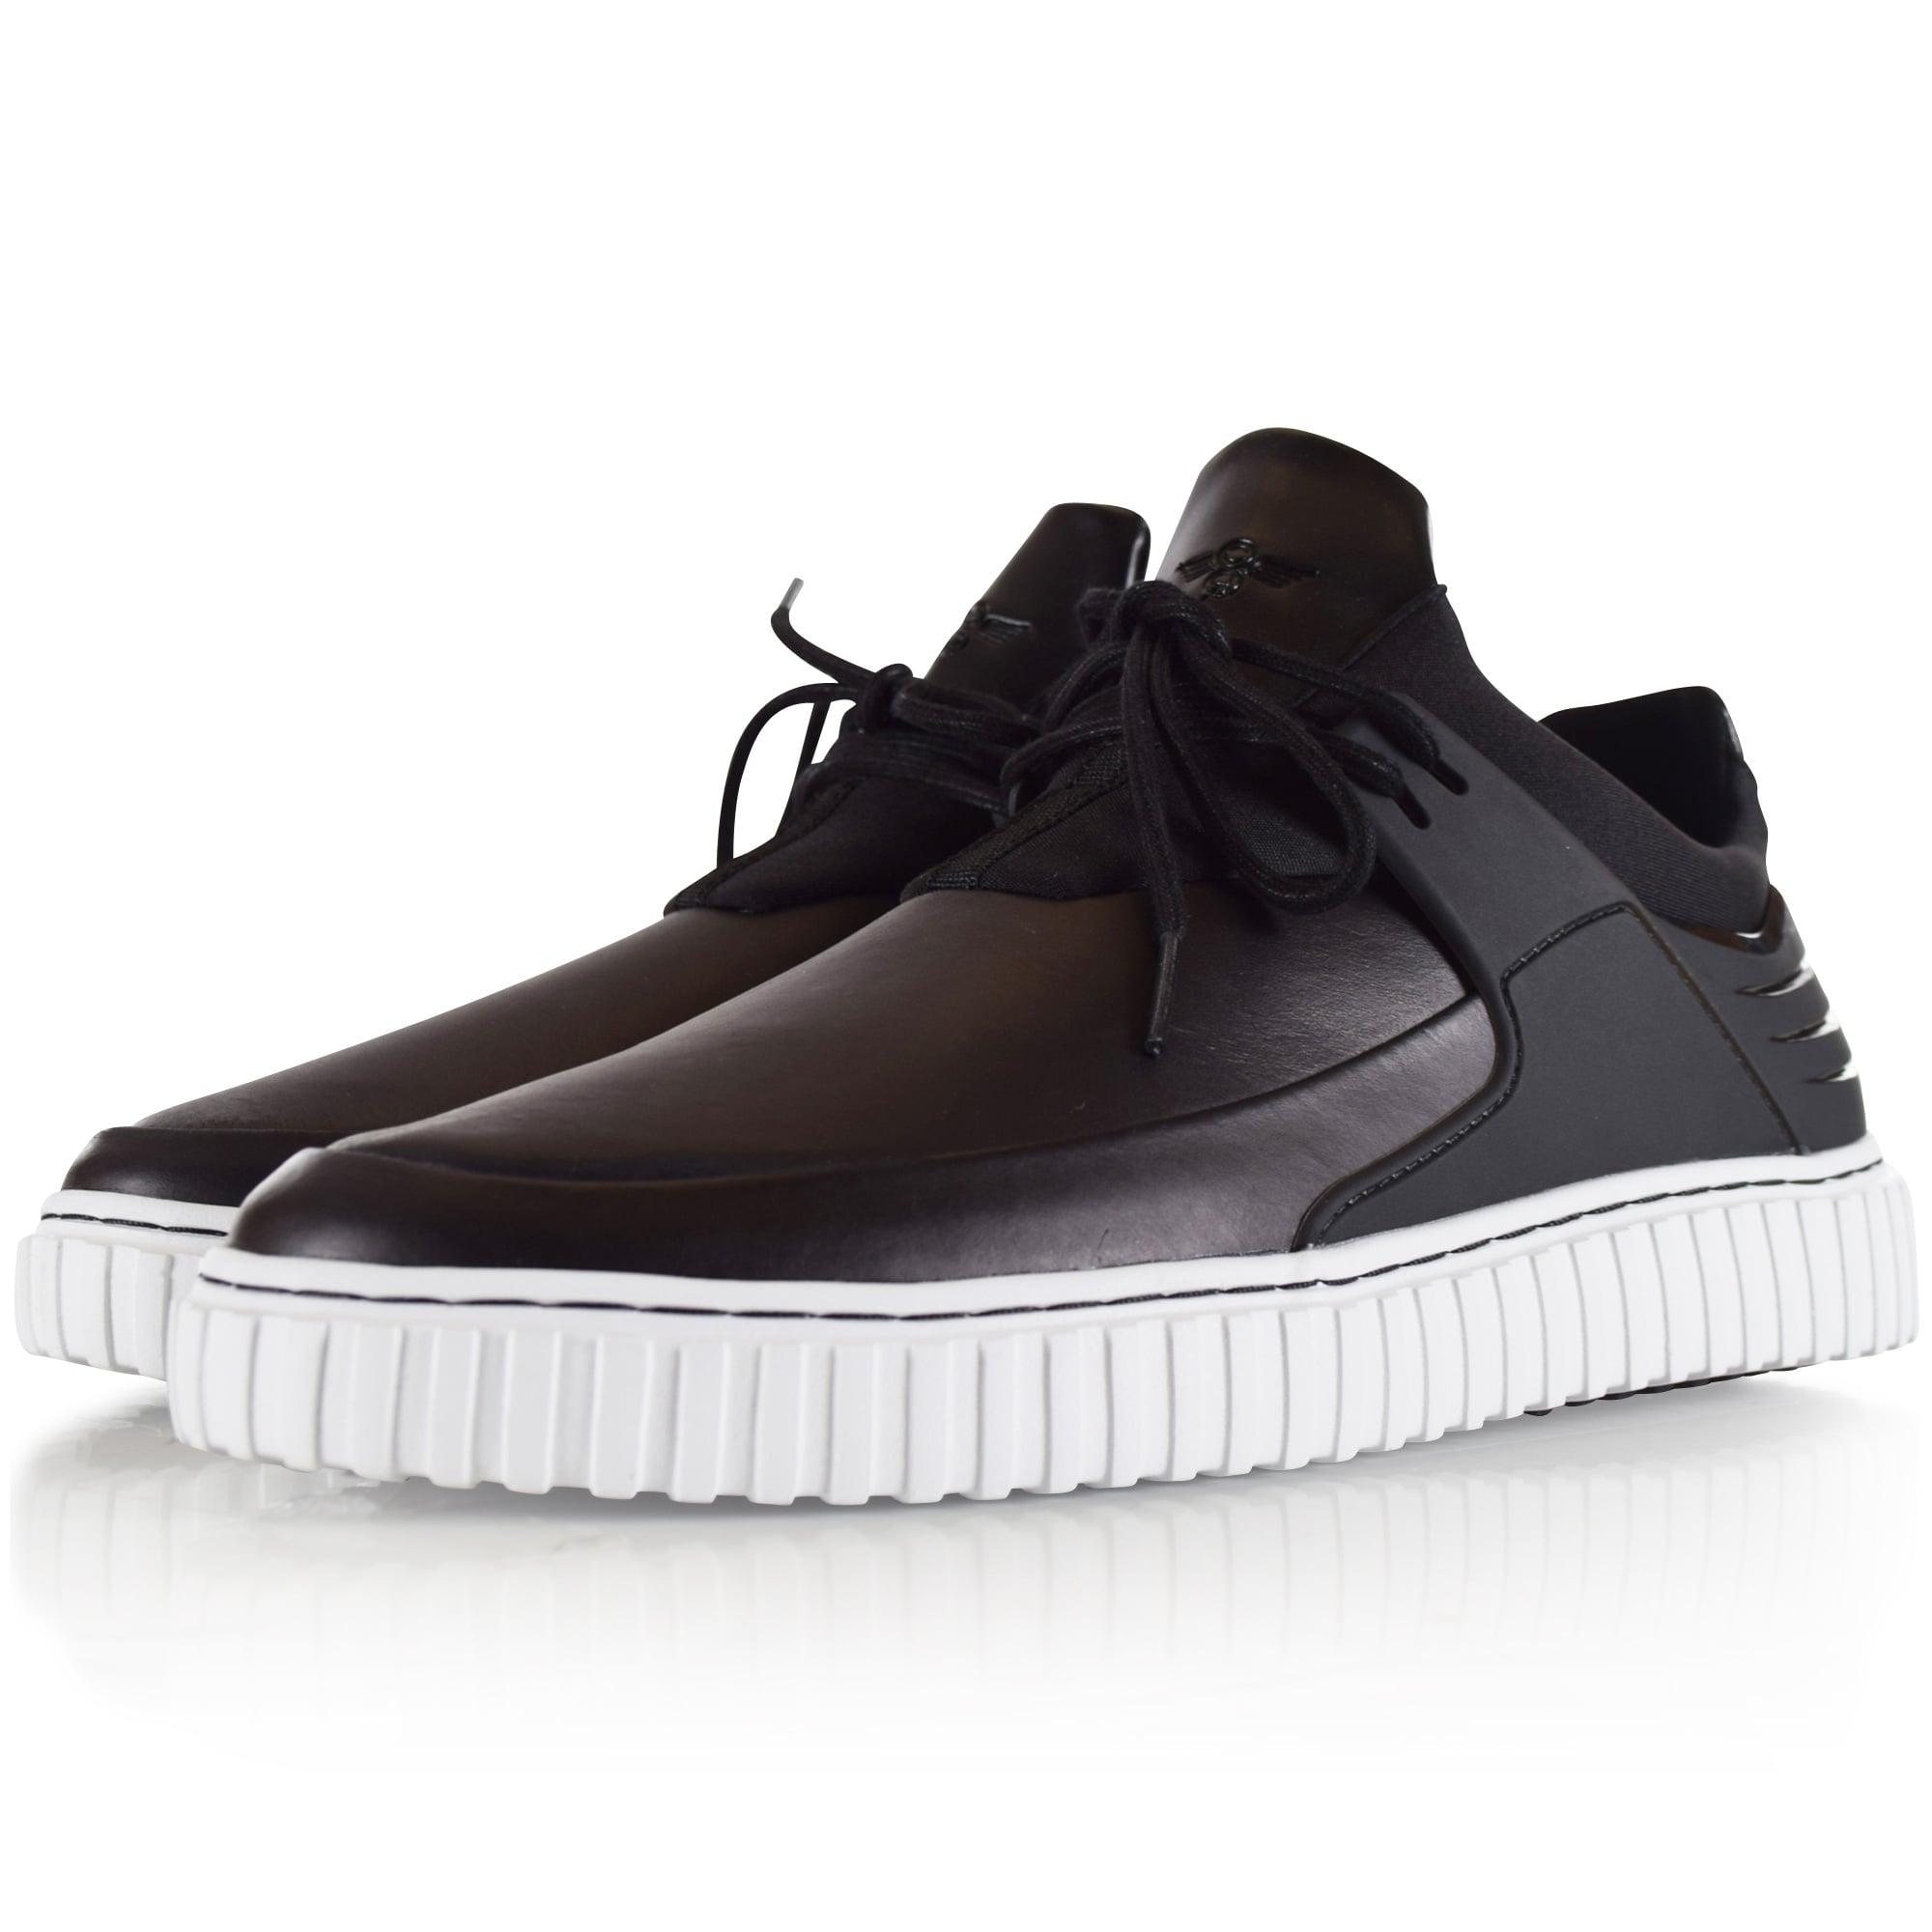 Black Castucci Trainers - Footwear